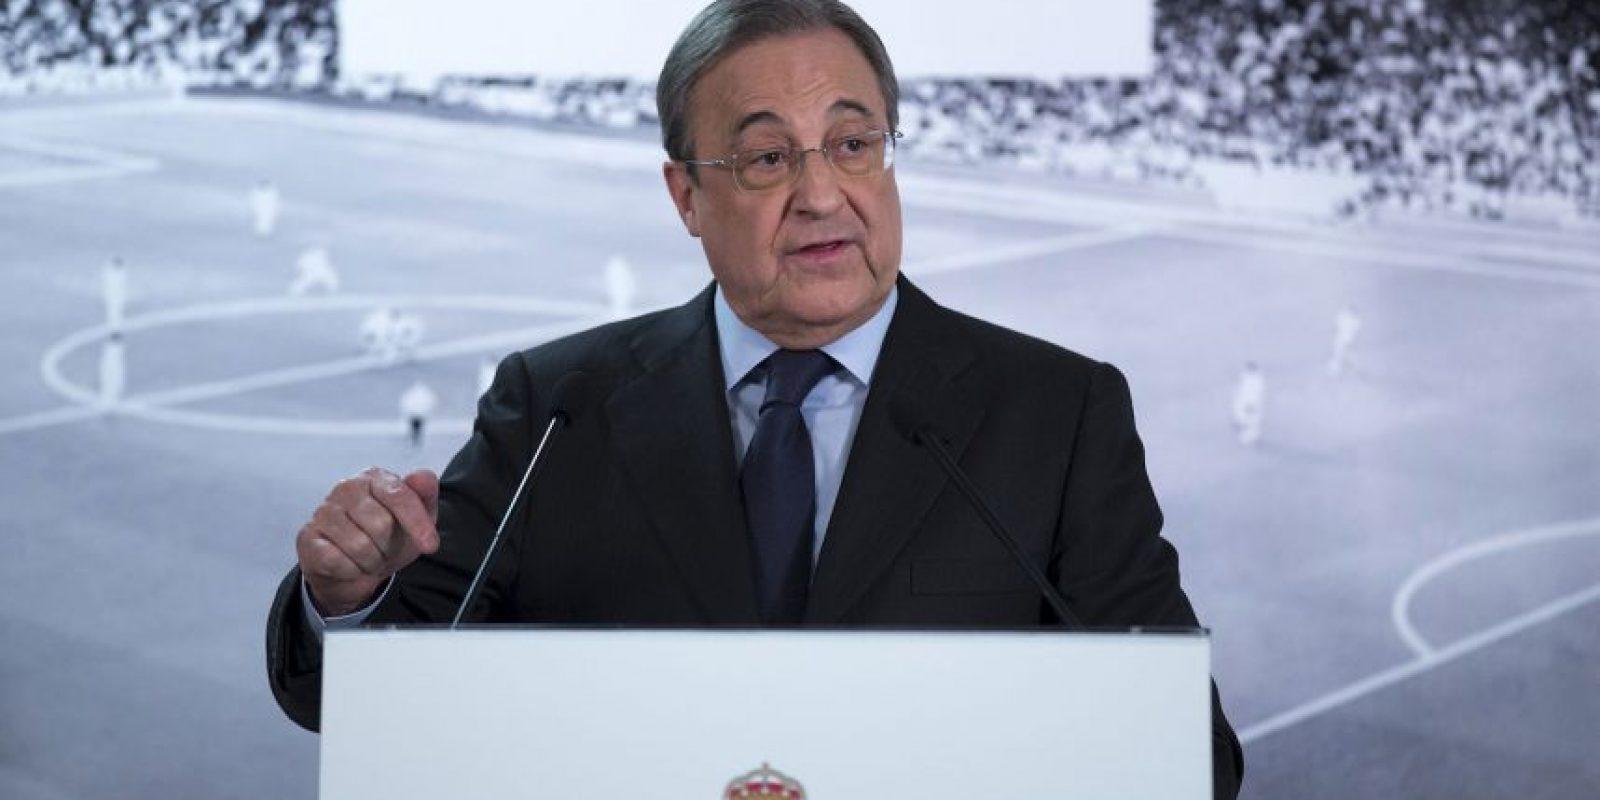 Florentino Pérez, presidente del Real Madrid Foto:Vía twitter.com/realmadrid